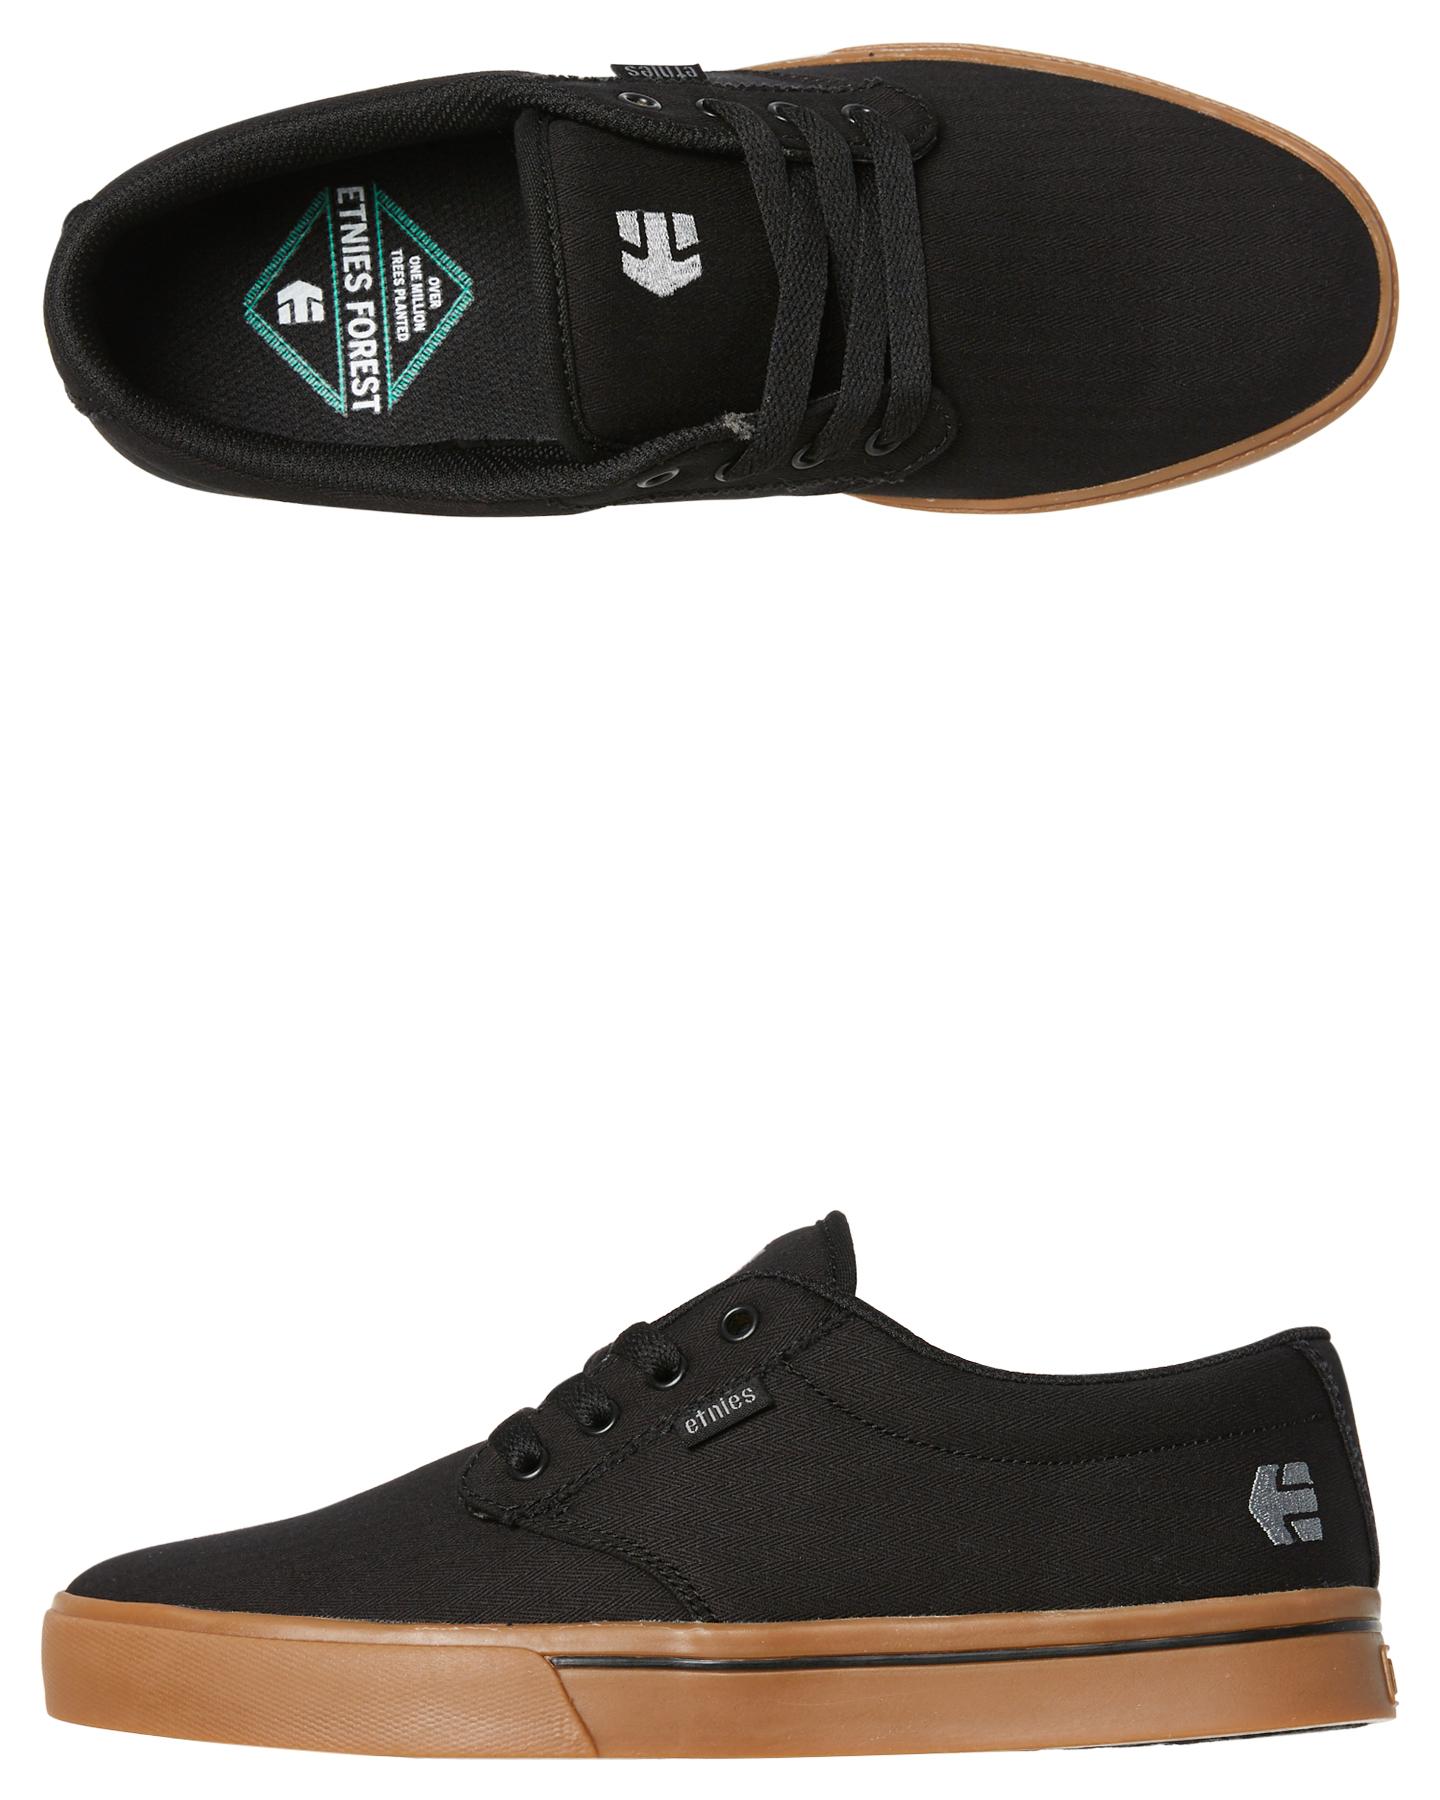 ae3ab4e0a216 New Etnies Jameson 2 Eco Shoe Plastic Pu Black